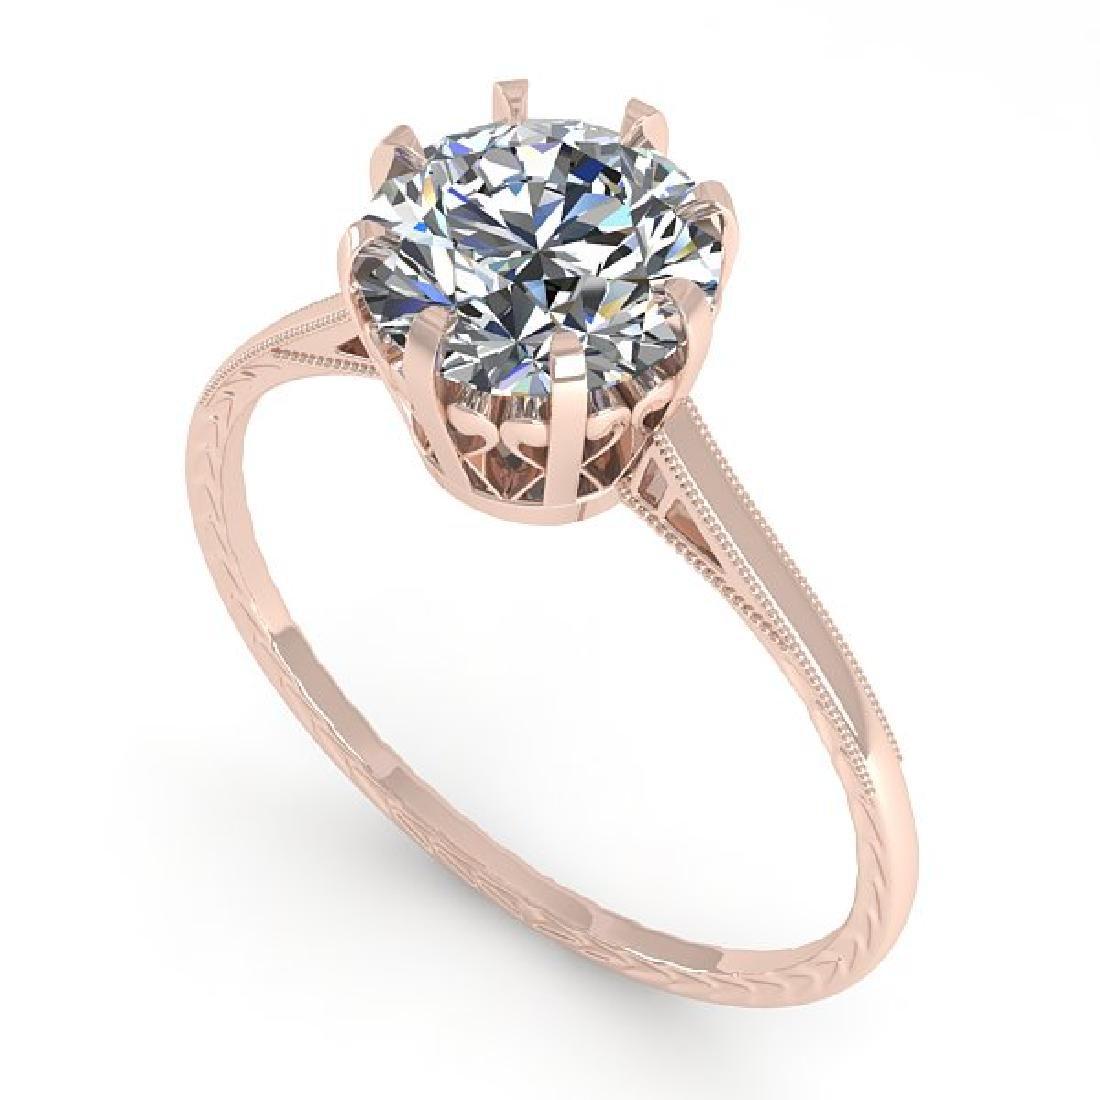 1.51 CTW Certified VS/SI Diamond Ring 14K Rose Gold - 2